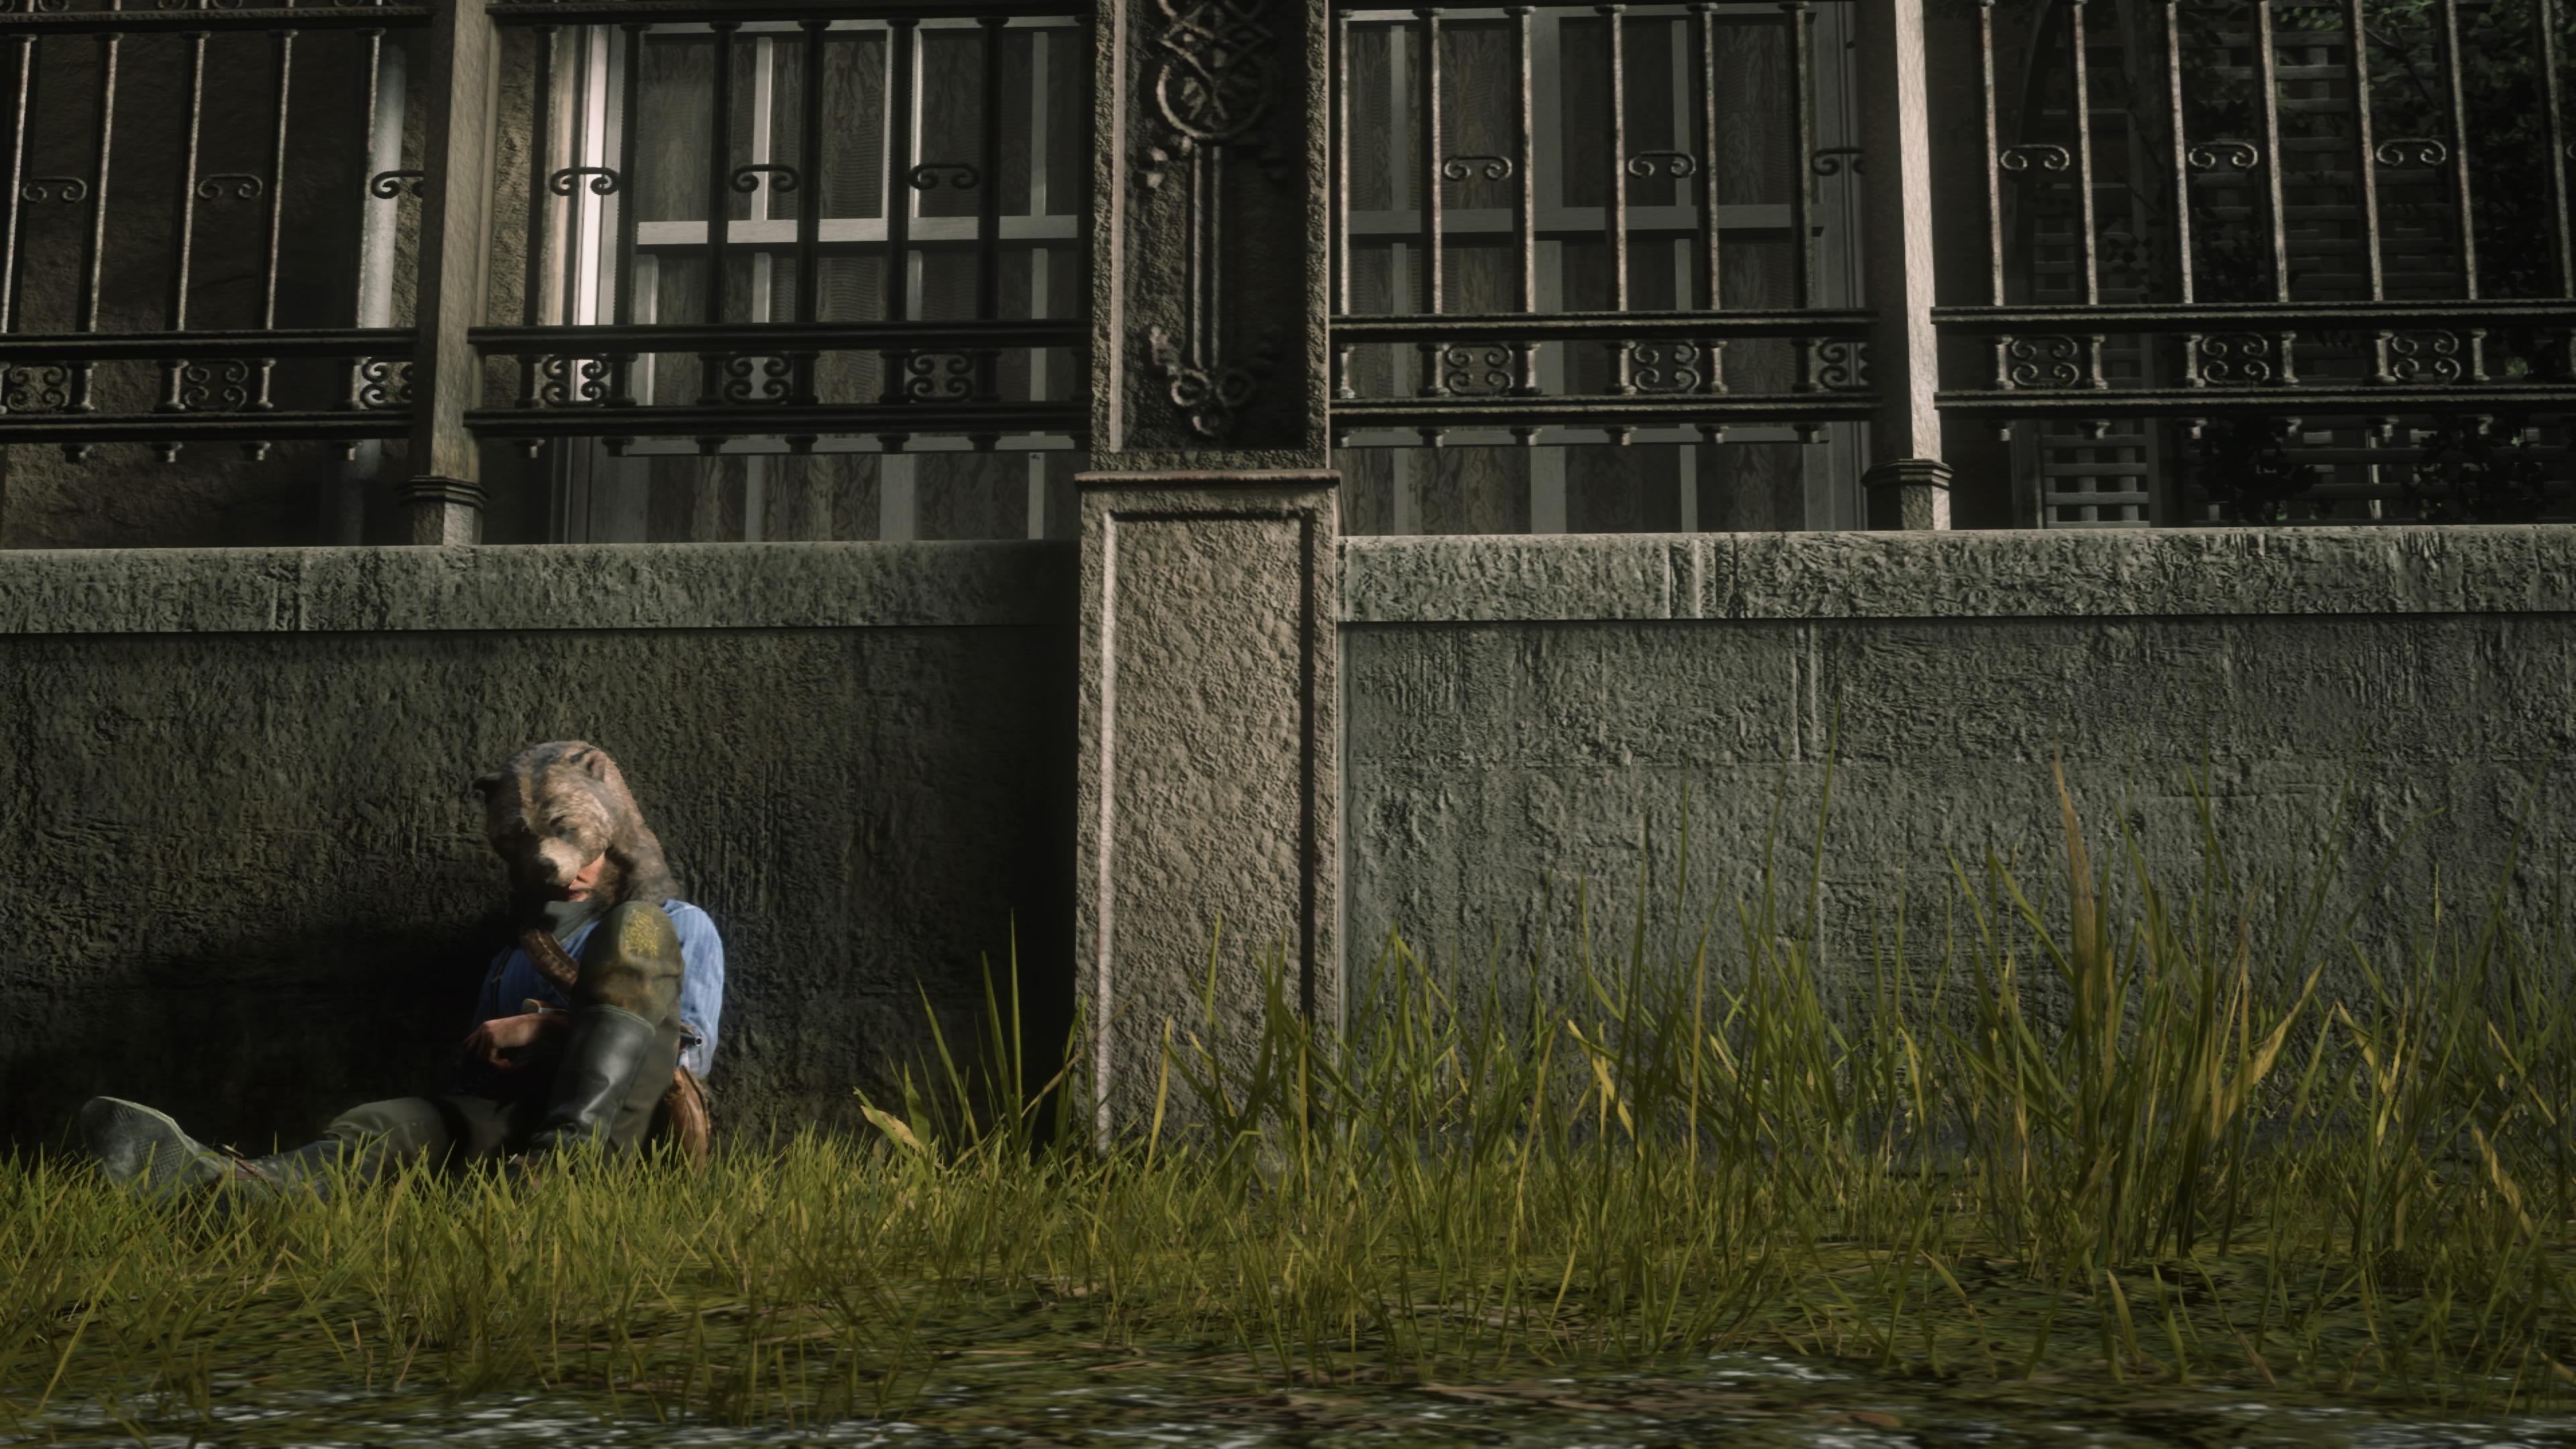 Red Dead Redemption 2 karhumies makoilee kadulla